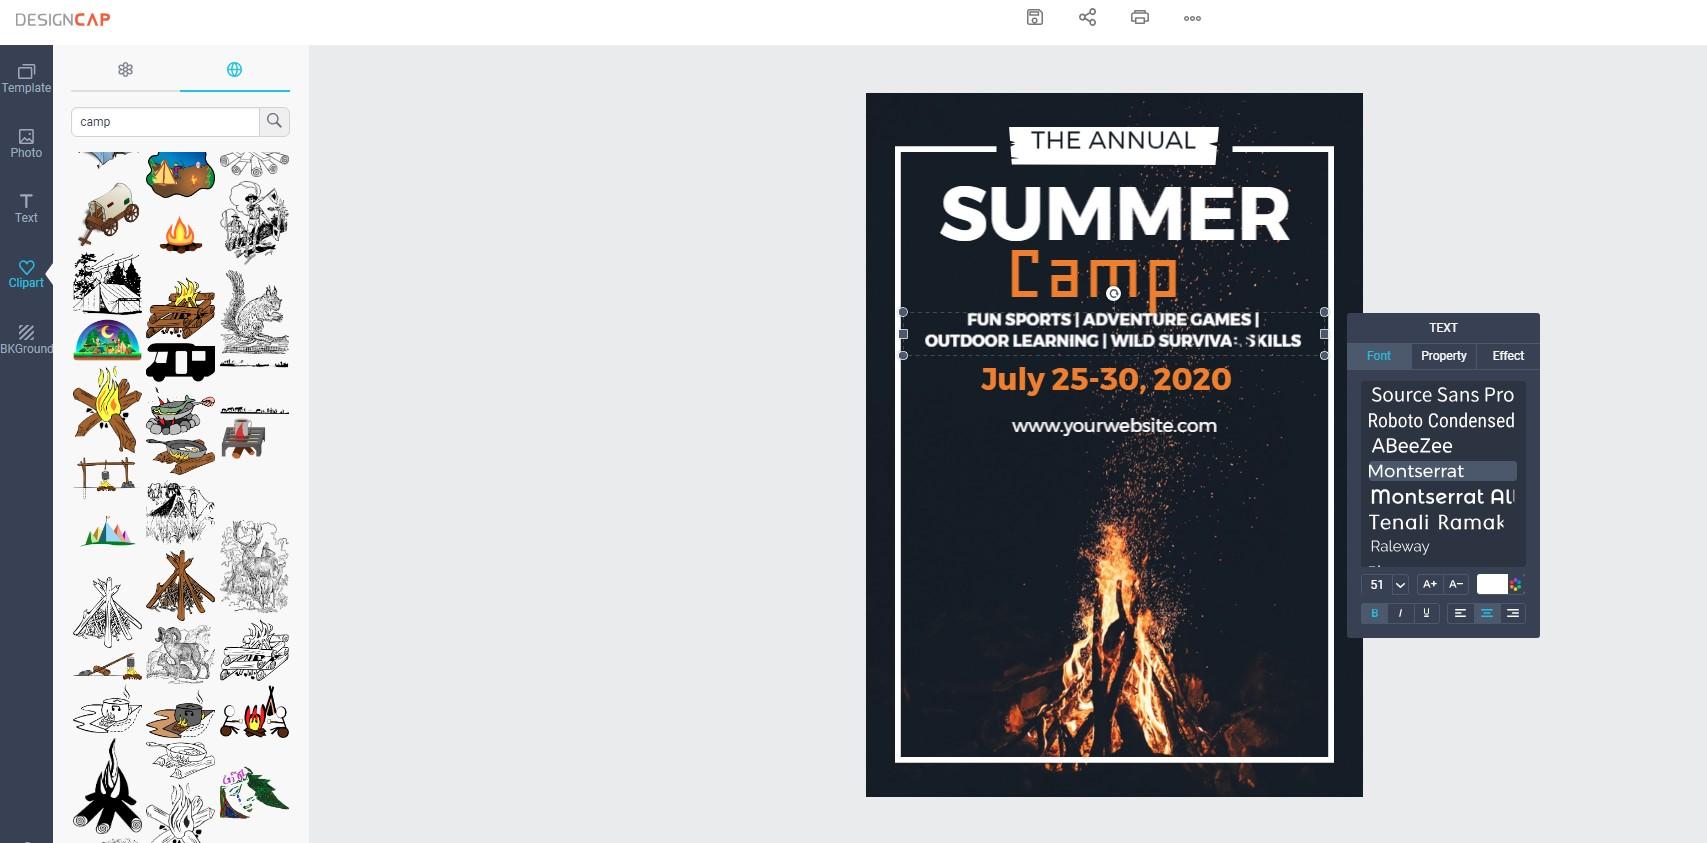 DesignCap Review: Make a Free Poster Online